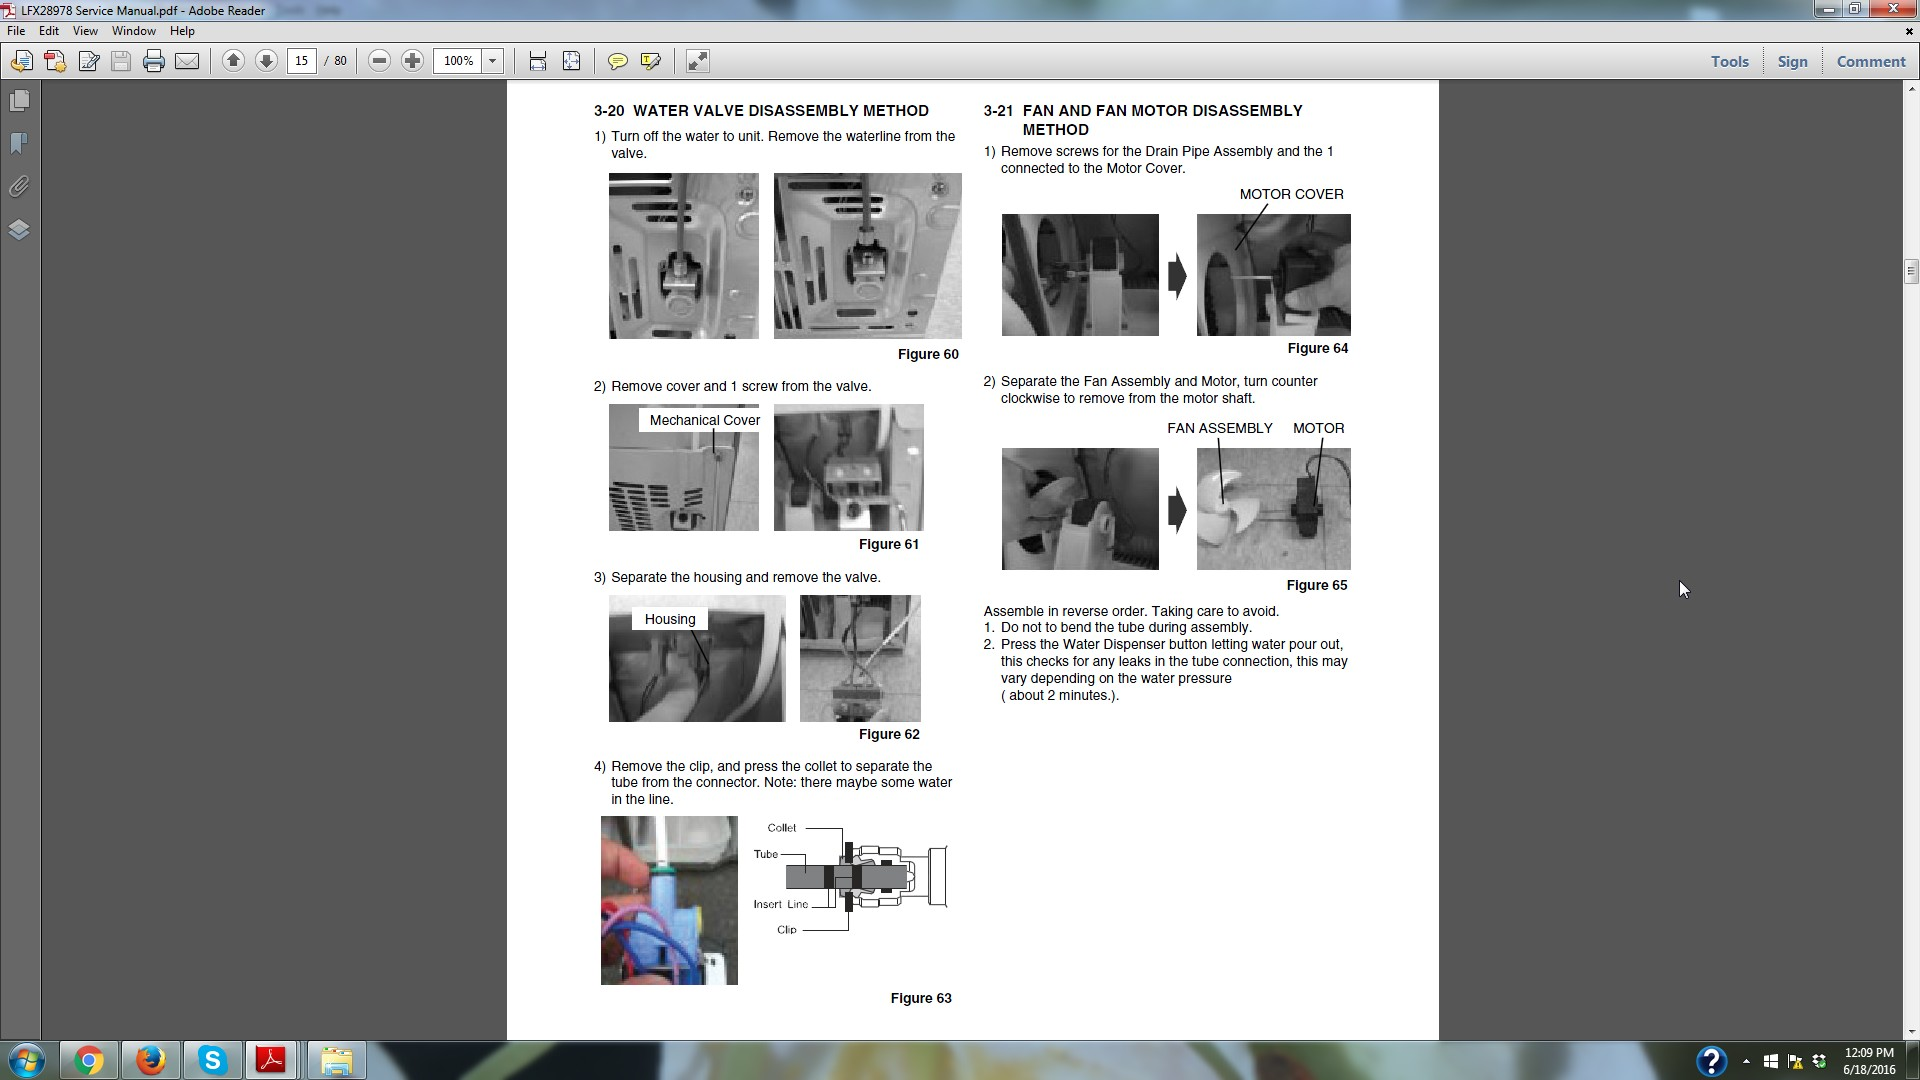 3ec31c89-1bf4-40af-9674-9bcd883c4ccf_ScreenHunter_2452 Jun. 18 12.09.jpg